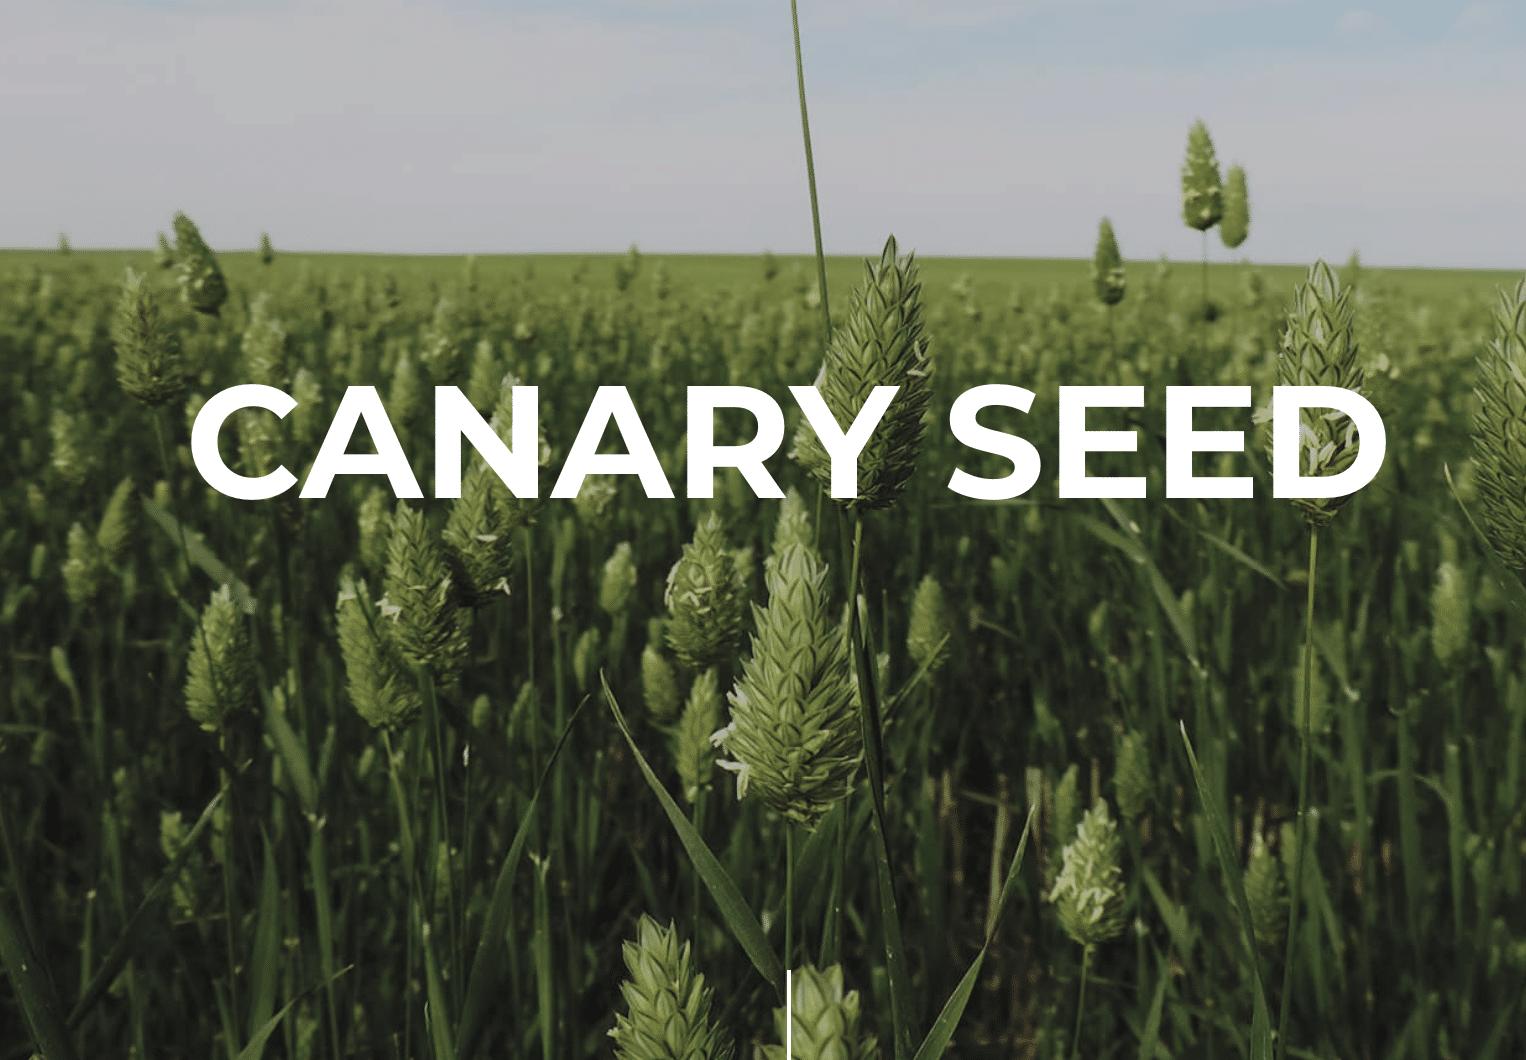 Canary seed